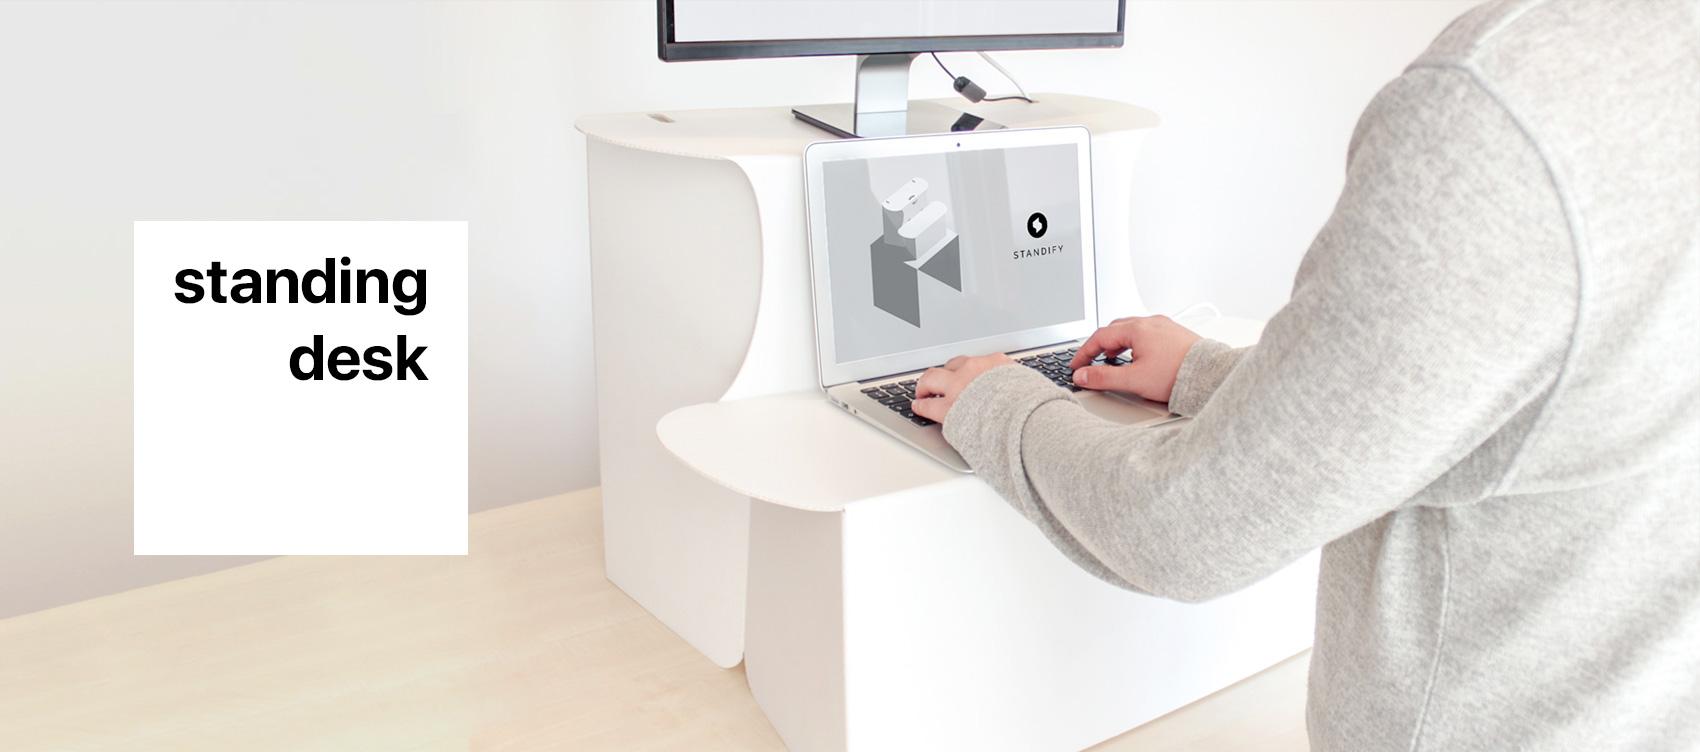 Standify standing desk